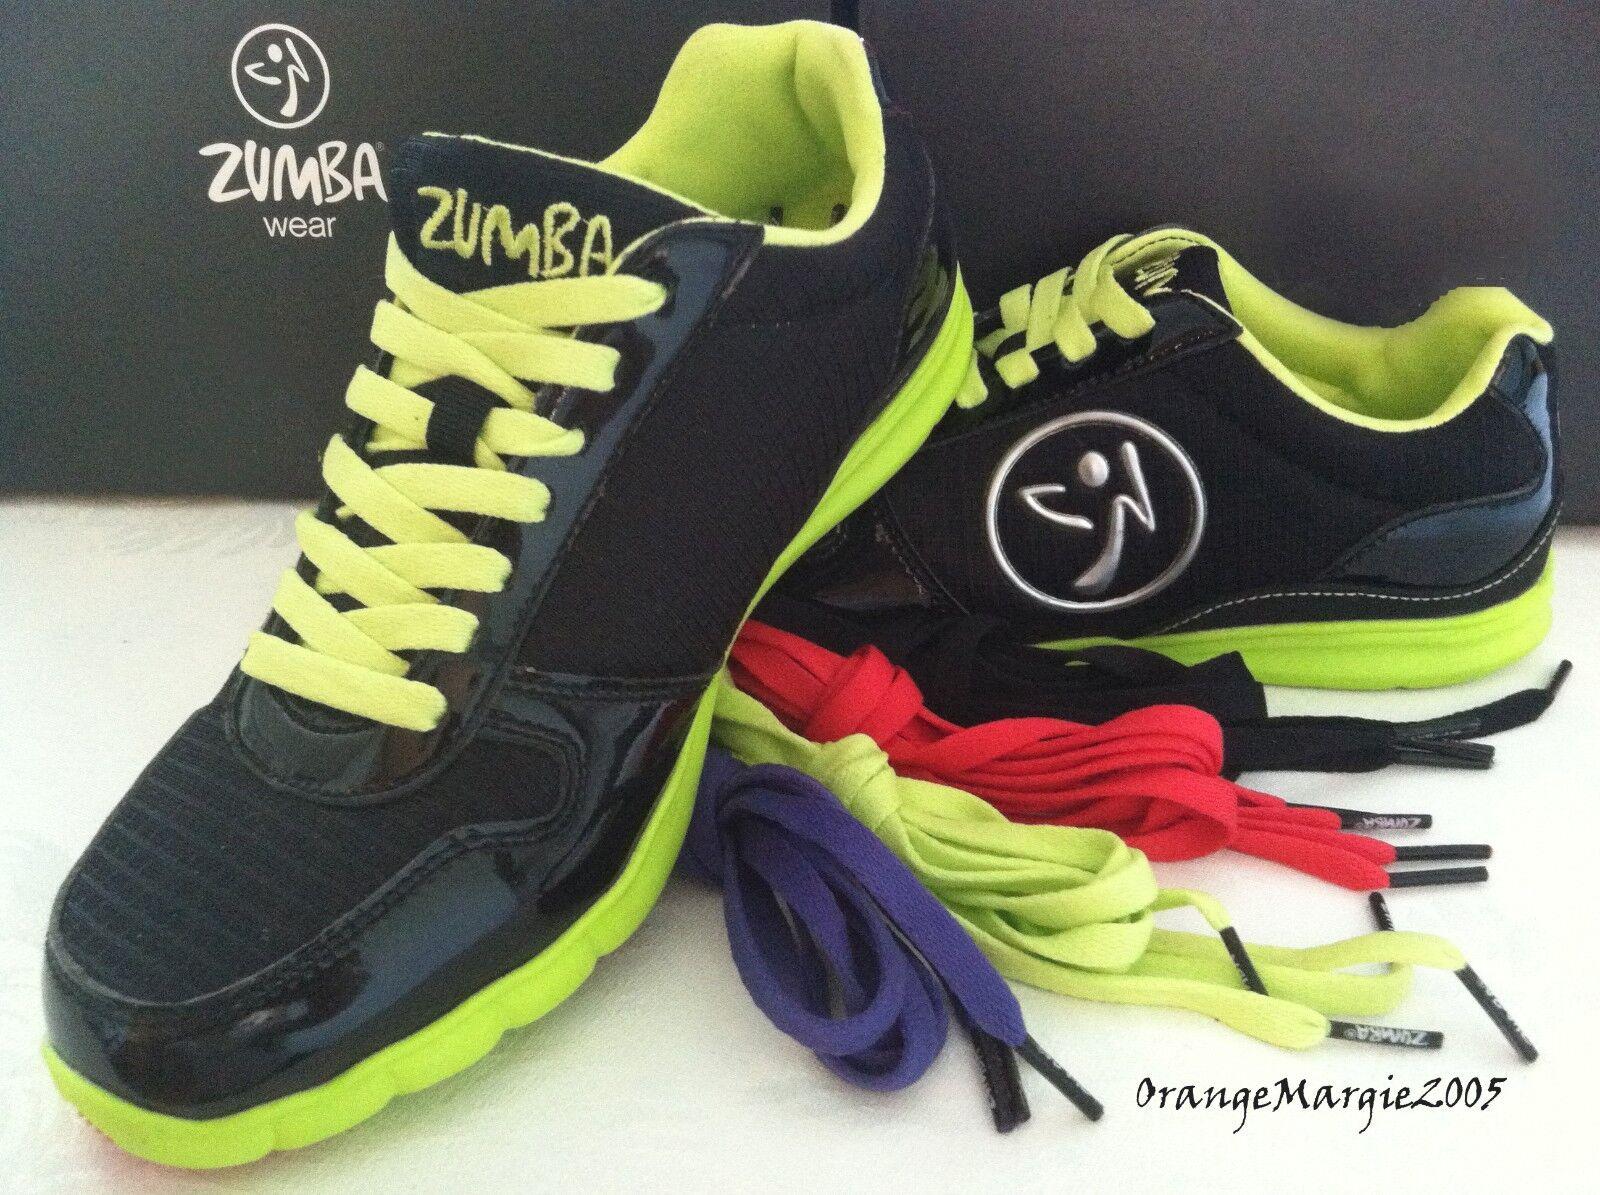 Zumba ZKICKZ schuhe TRAINERS Turnschuhe HIPHOP DANCE DANCE DANCE  The Original Official 6,7,8,9 421213